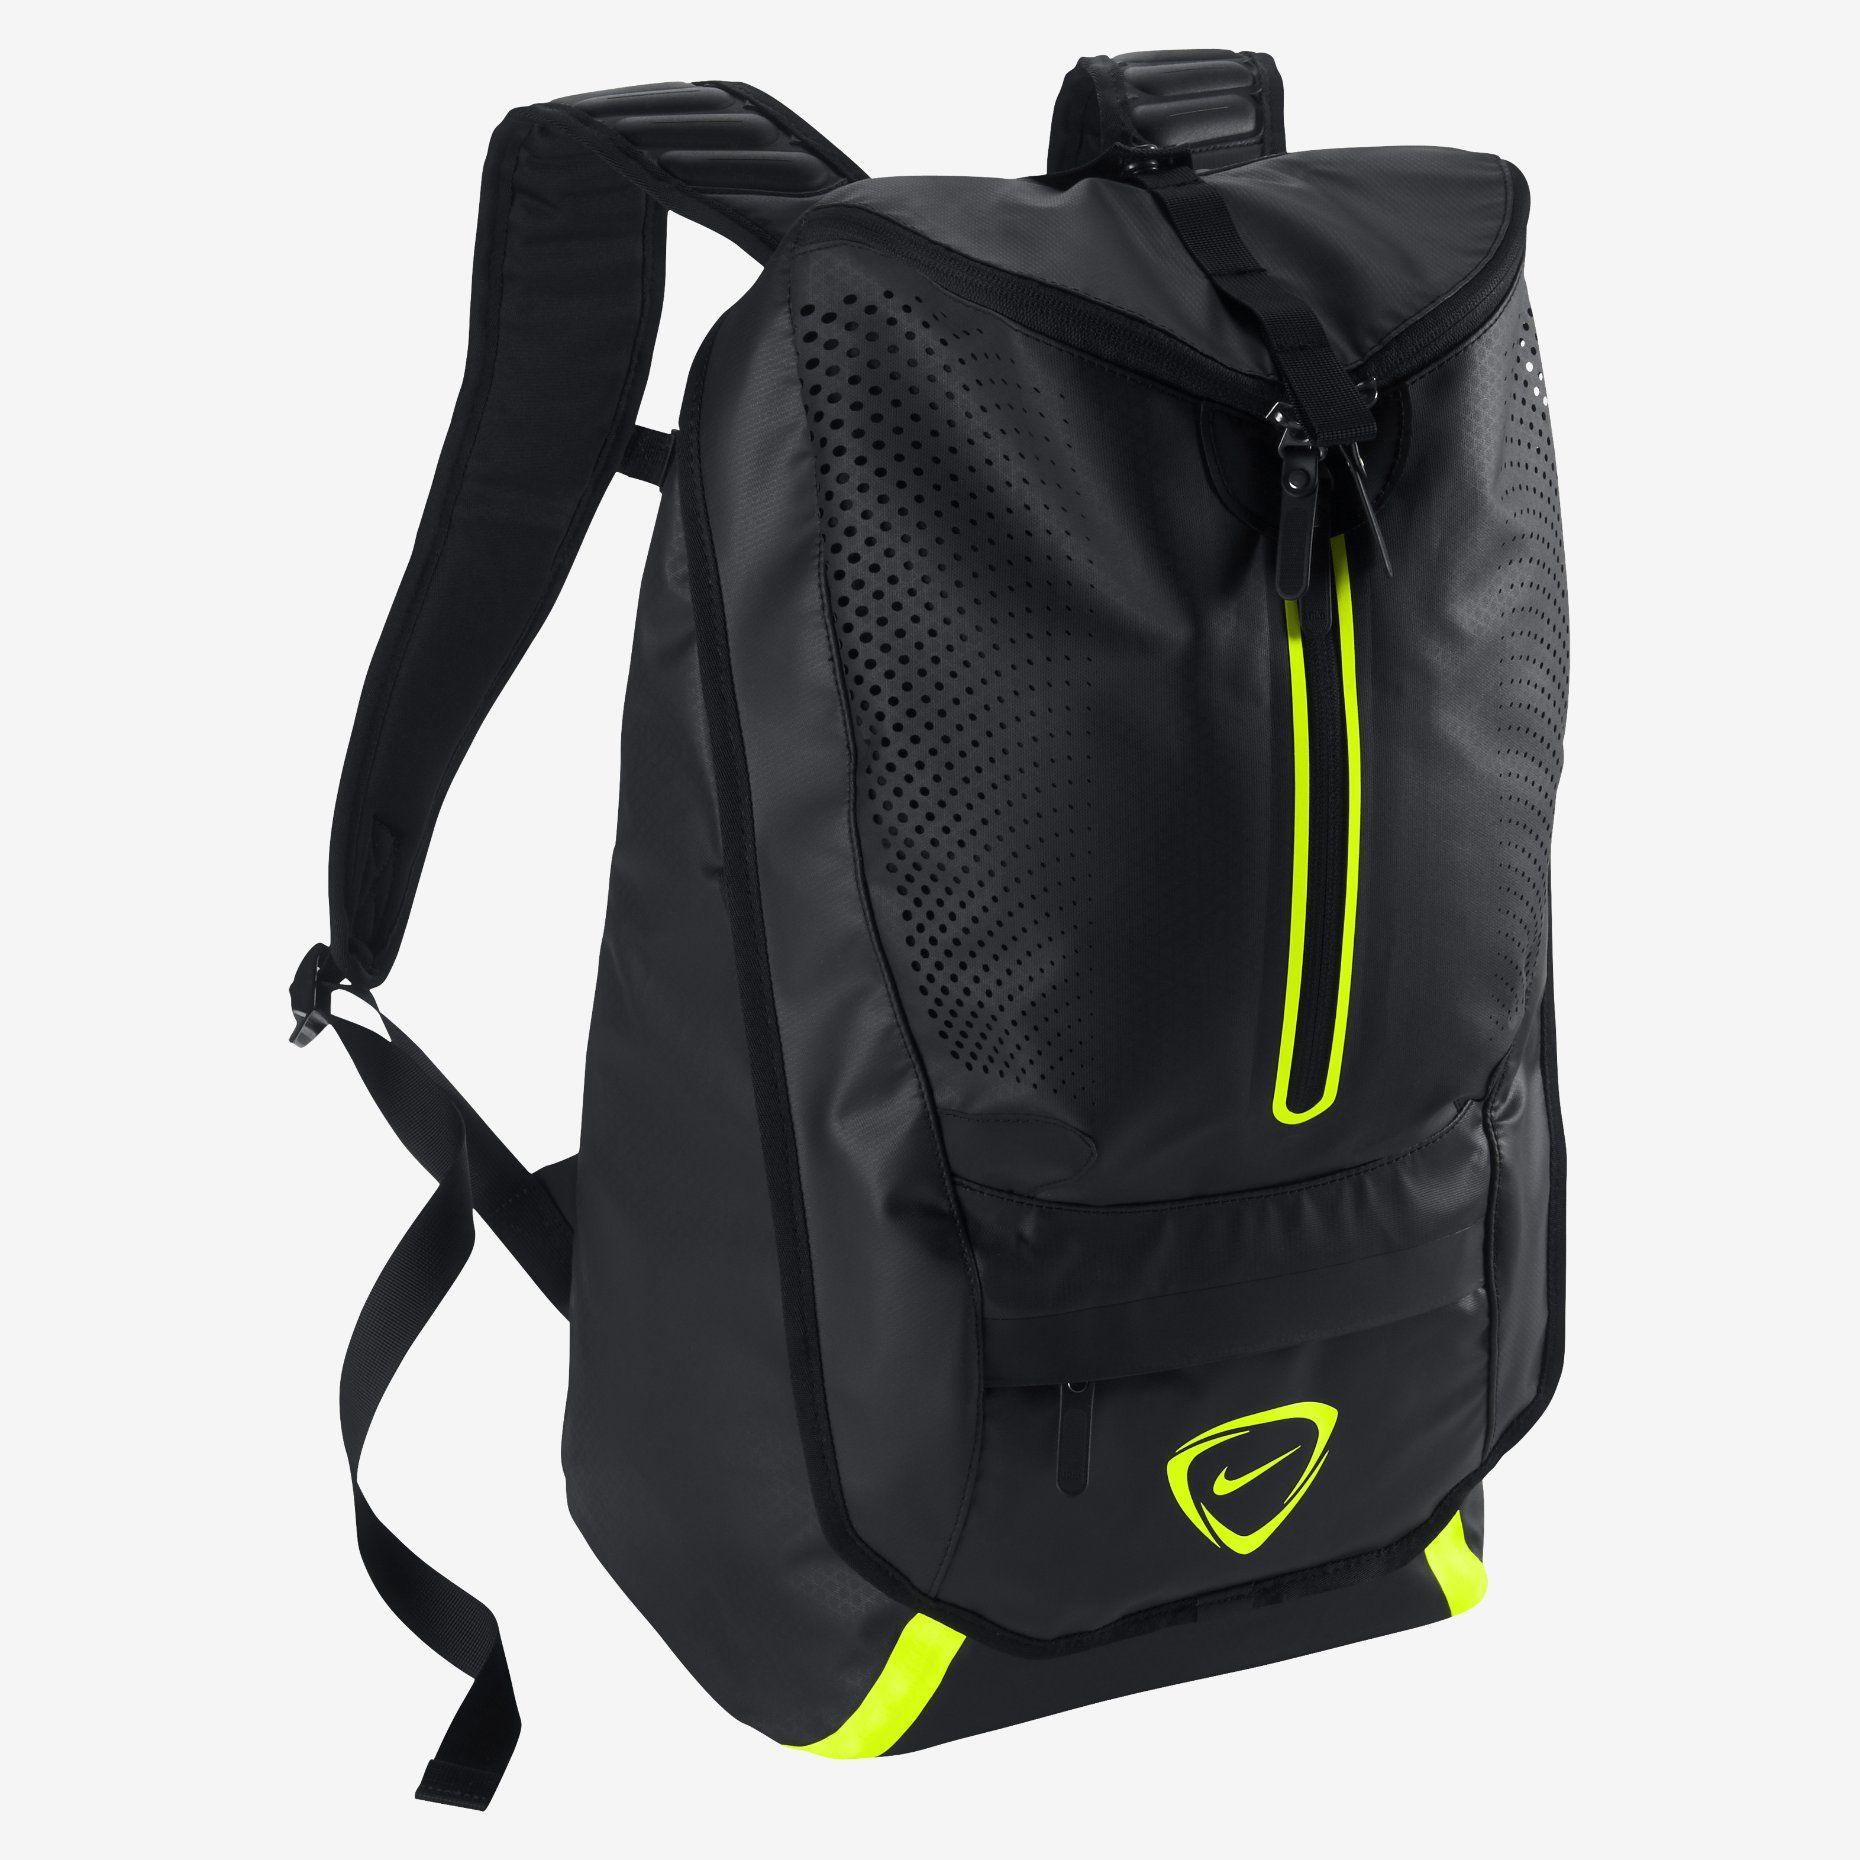 Football Nike Hyper Shield Air BAGPACKS BackpackBAGS Max rQotsCBdhx